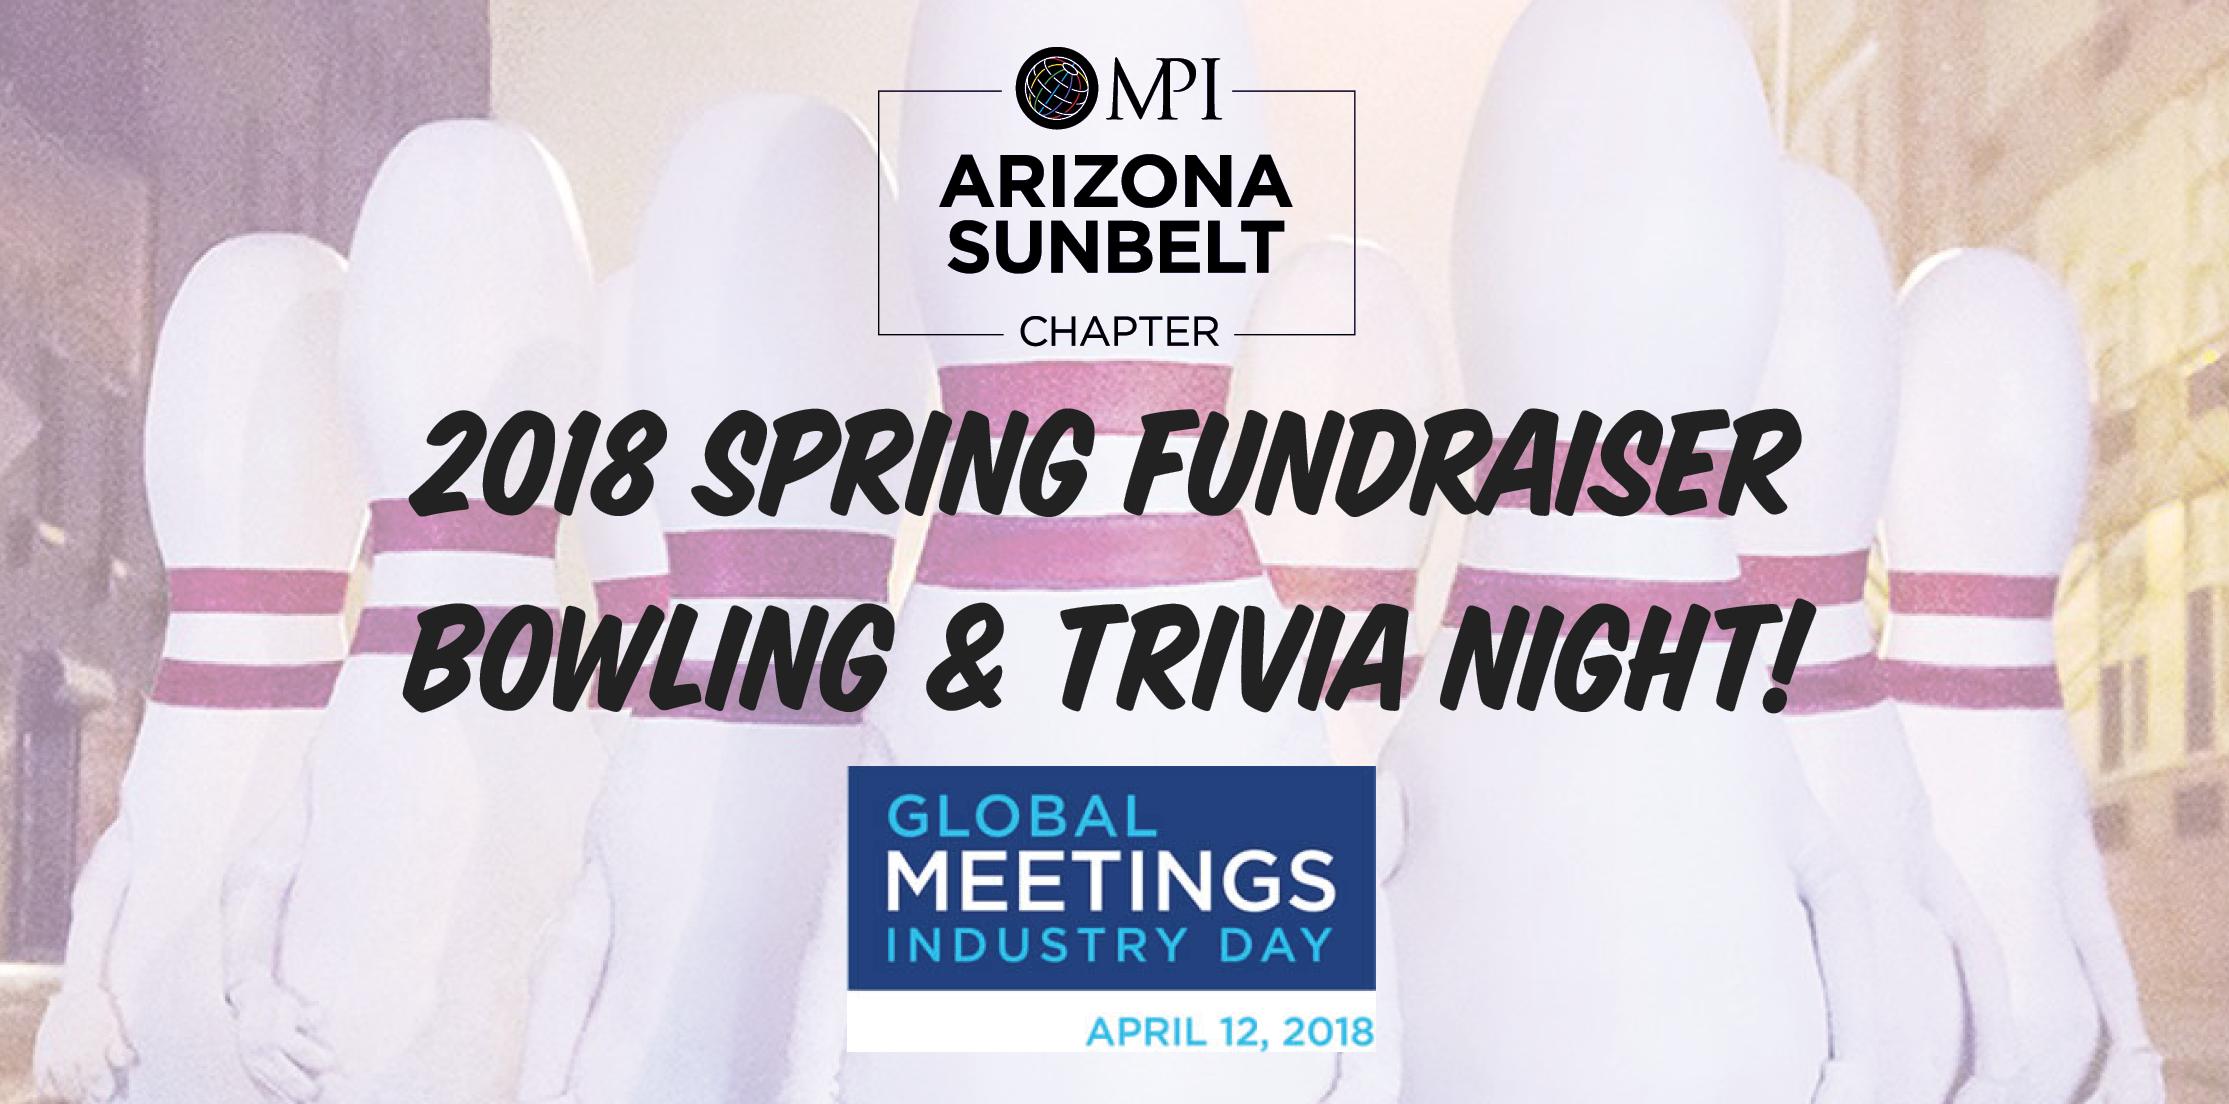 MPI AZ 2018 Spring Fundraiser